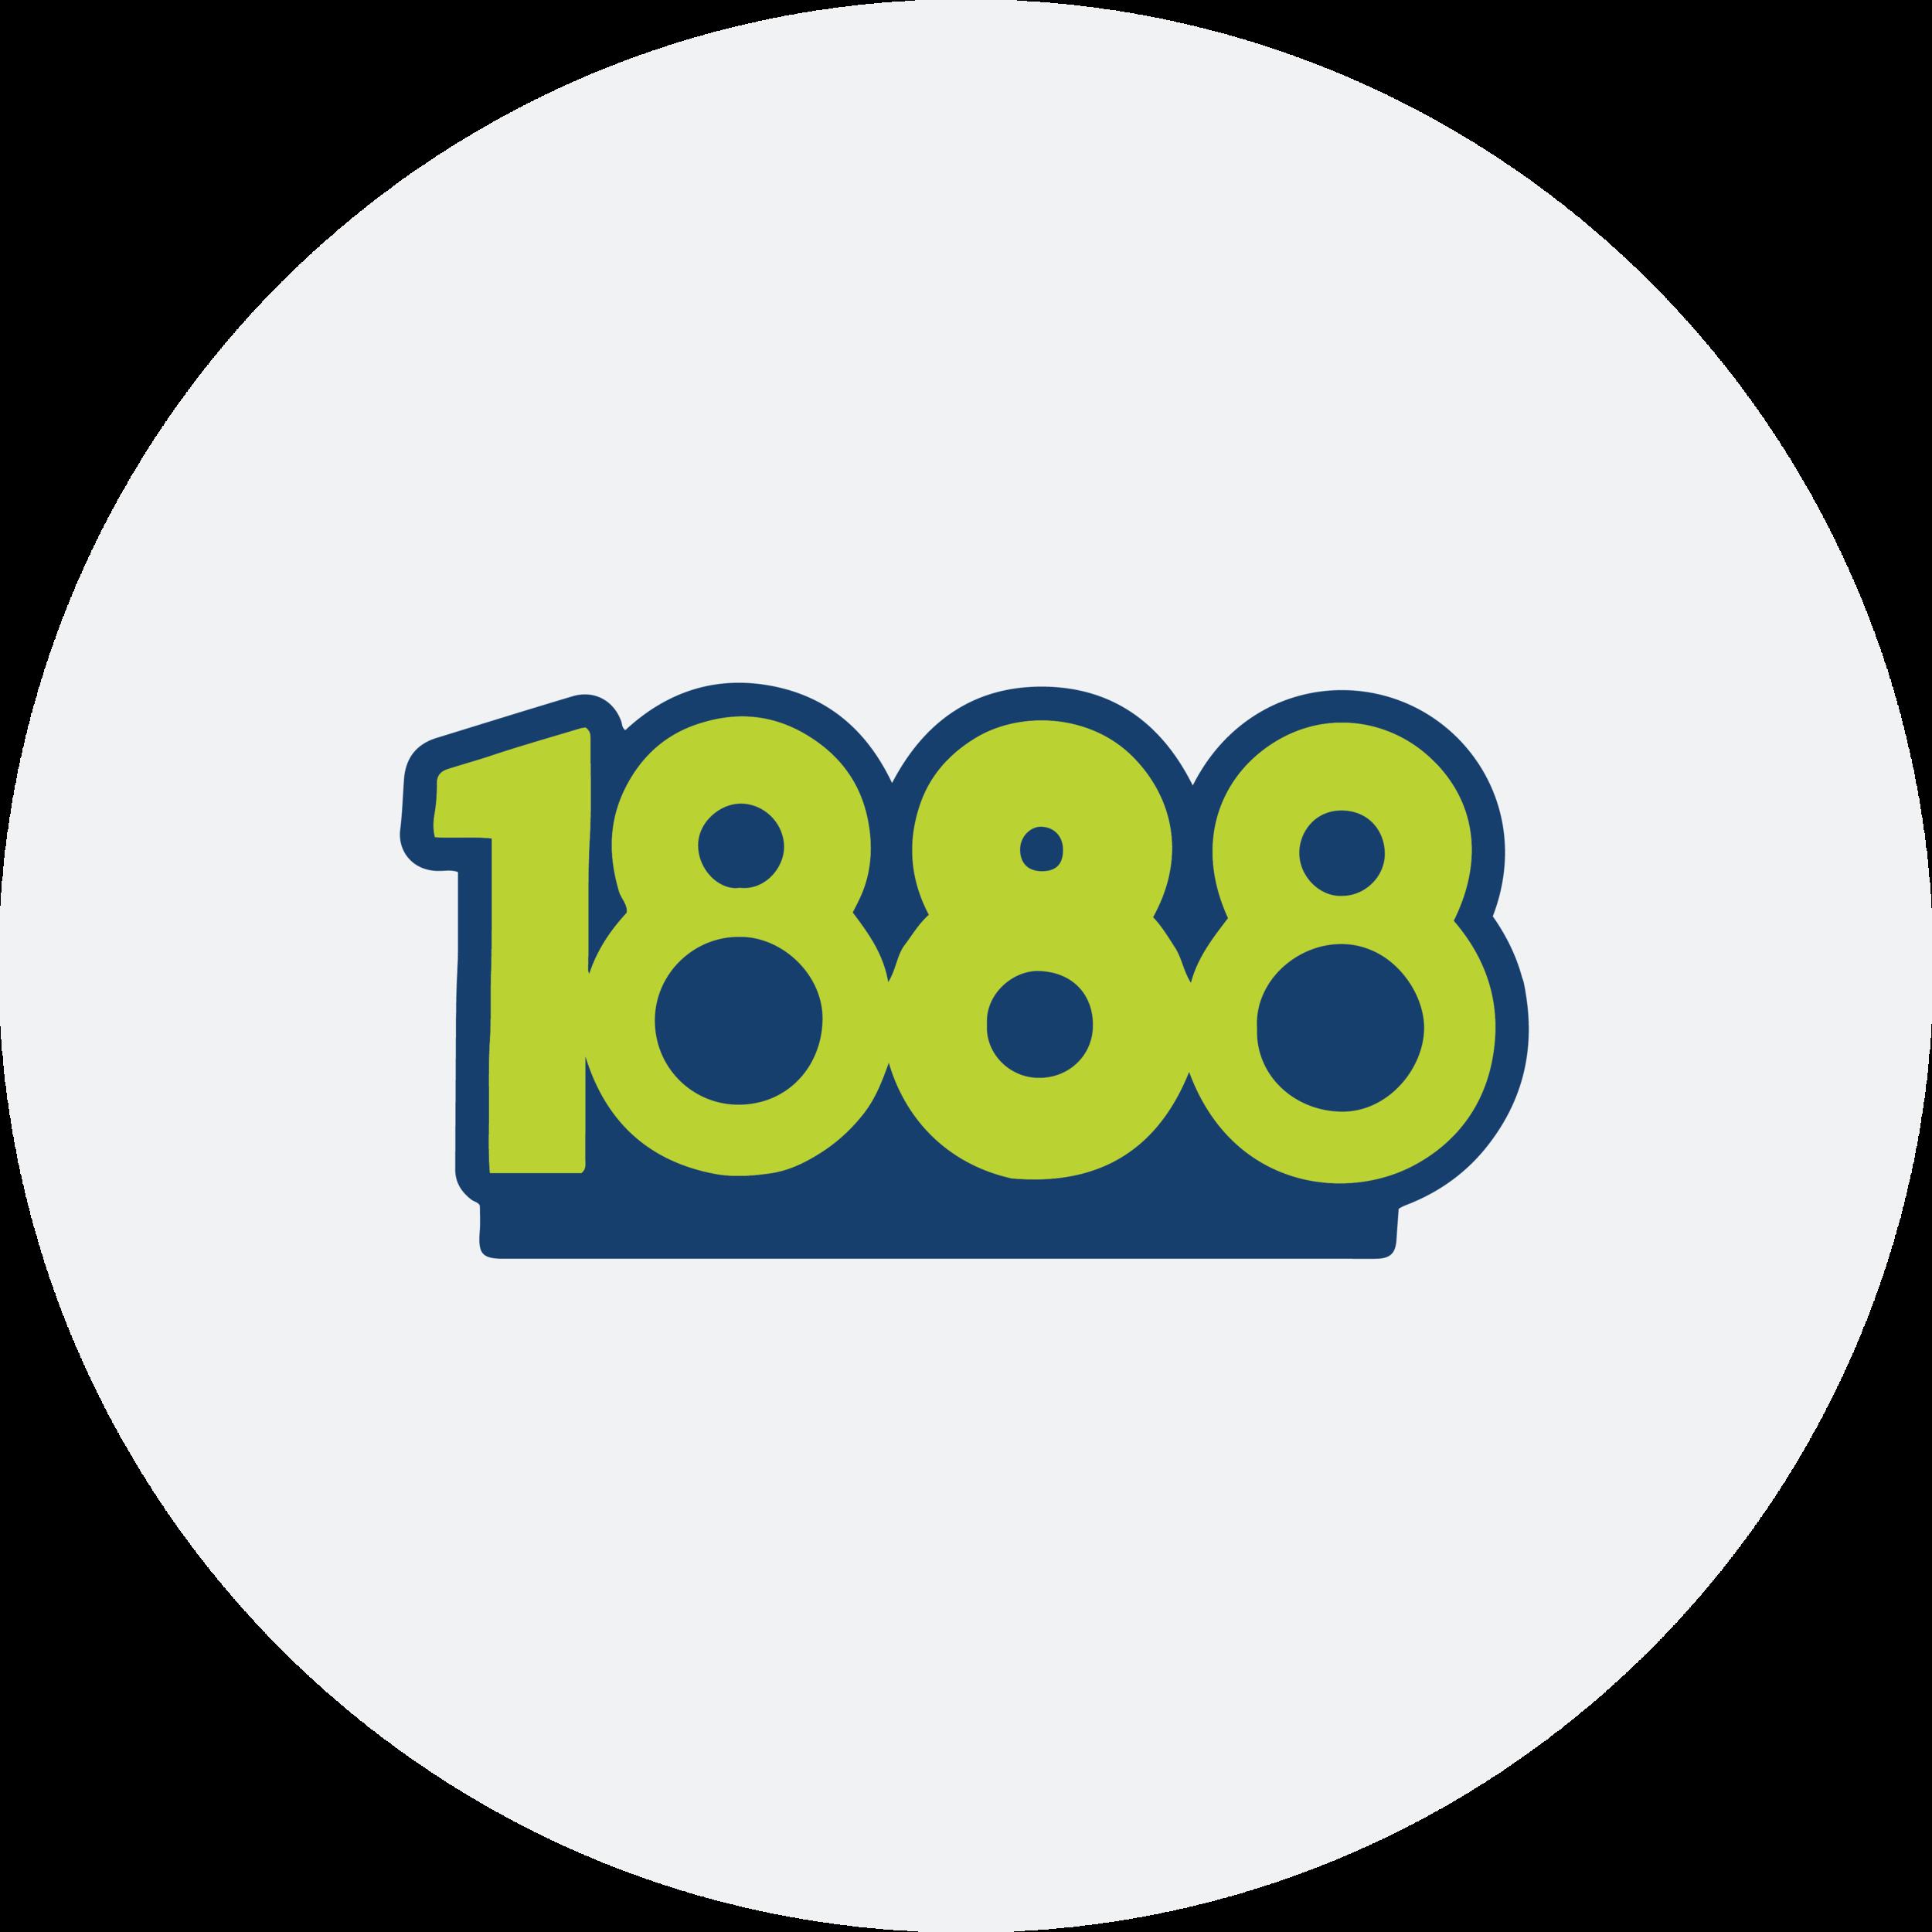 1888directoryassistance.png